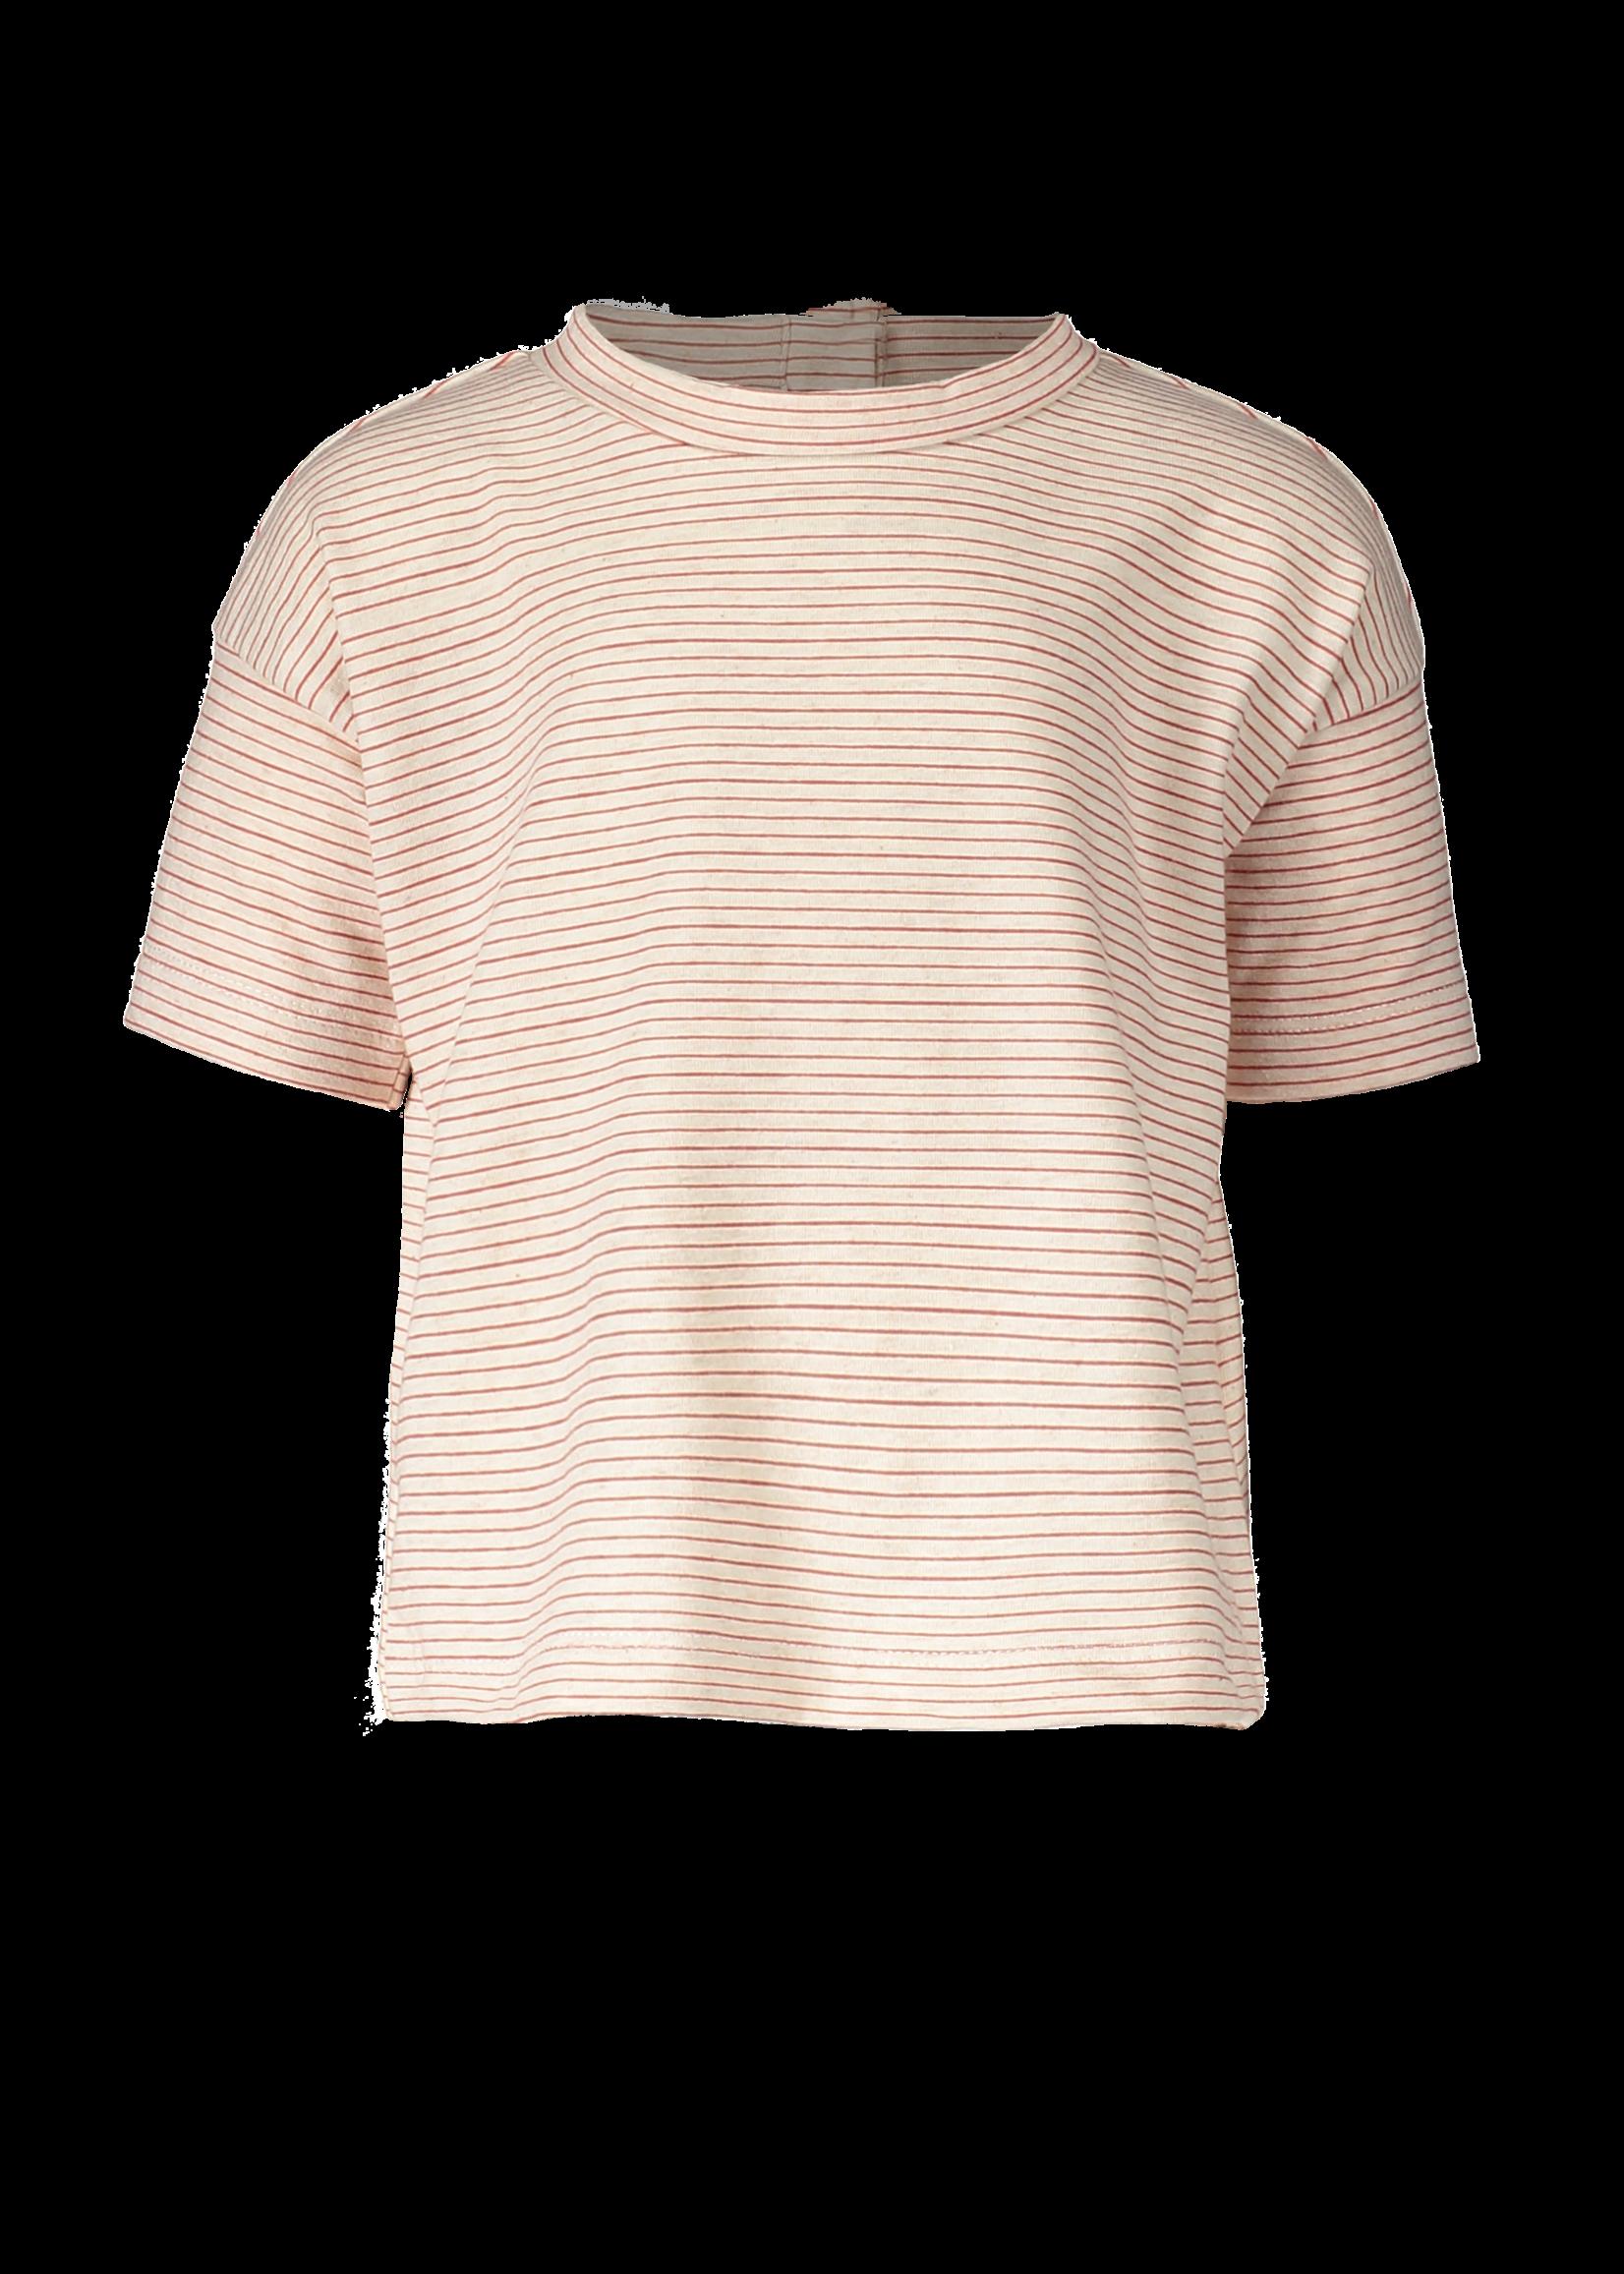 Pexi Lexi PL - T-Shirt - Stripe